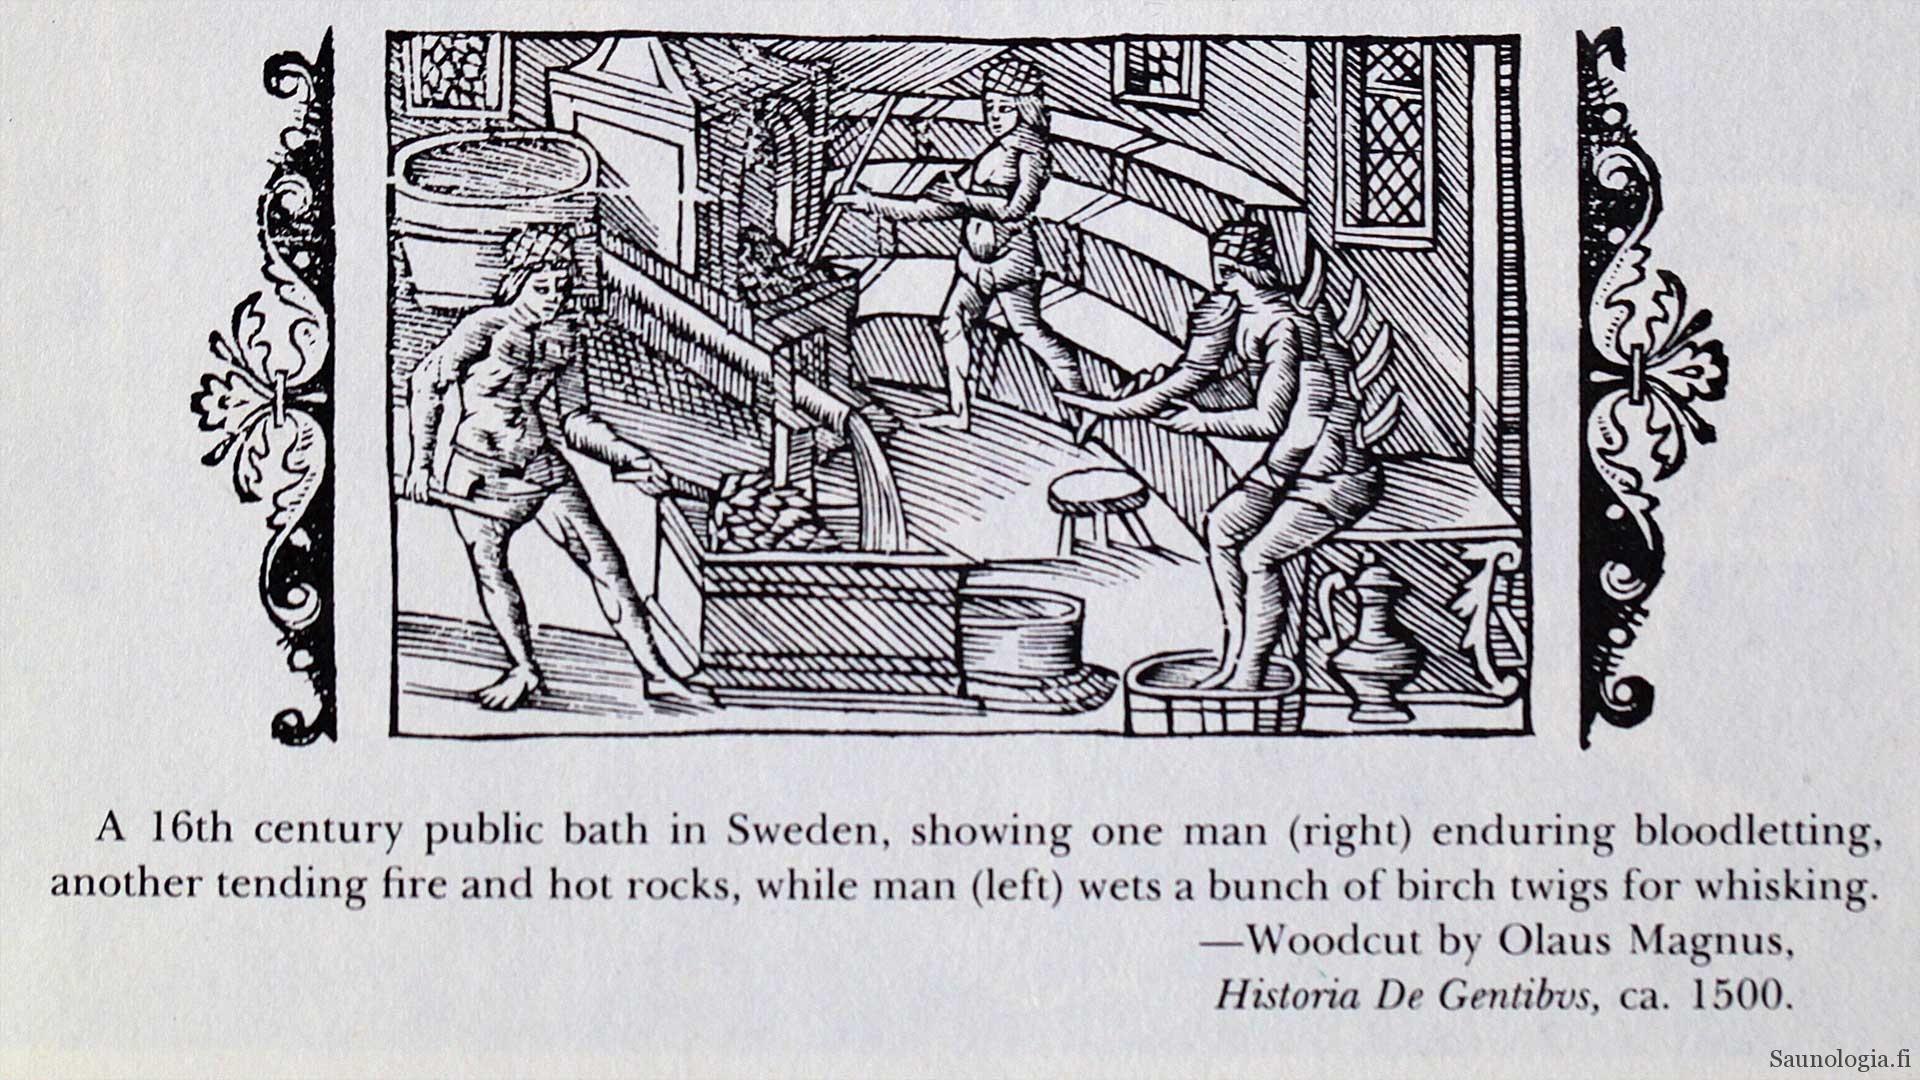 1500-Olaus_Magnus-Medieval_sauna_bathing